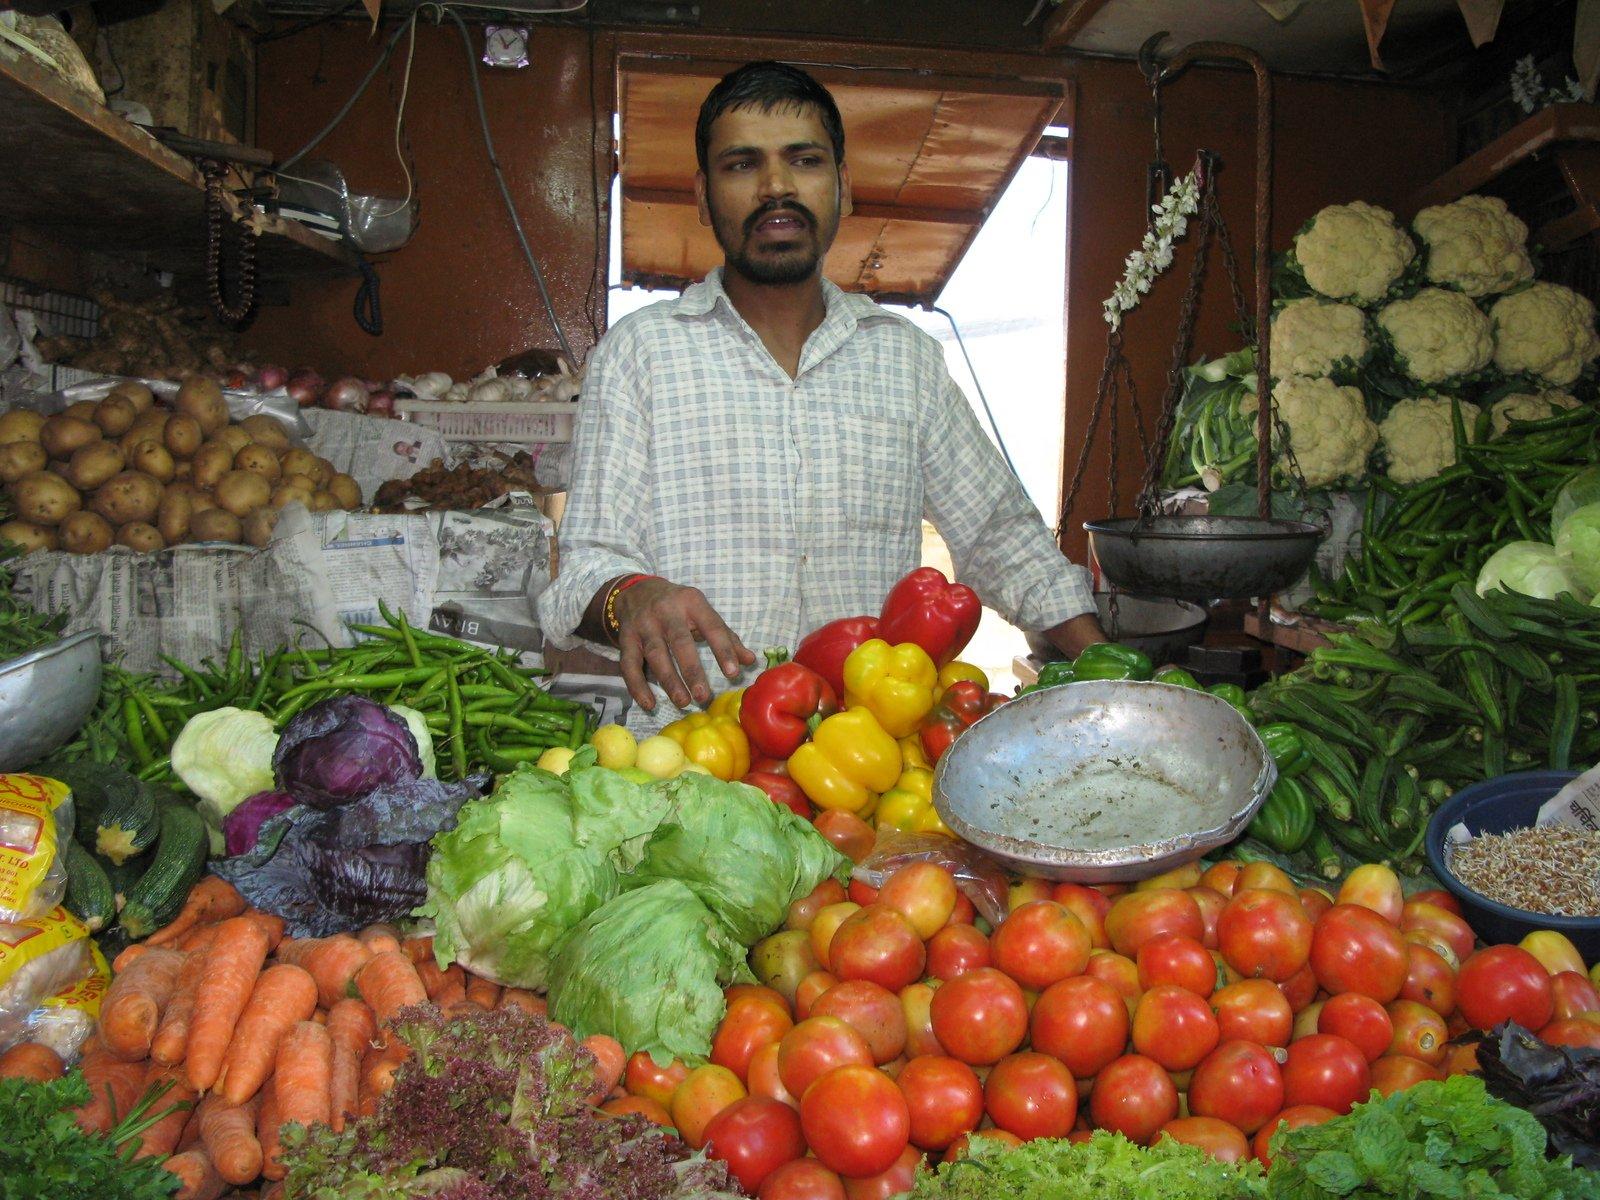 Vegetable Vendor Clipart